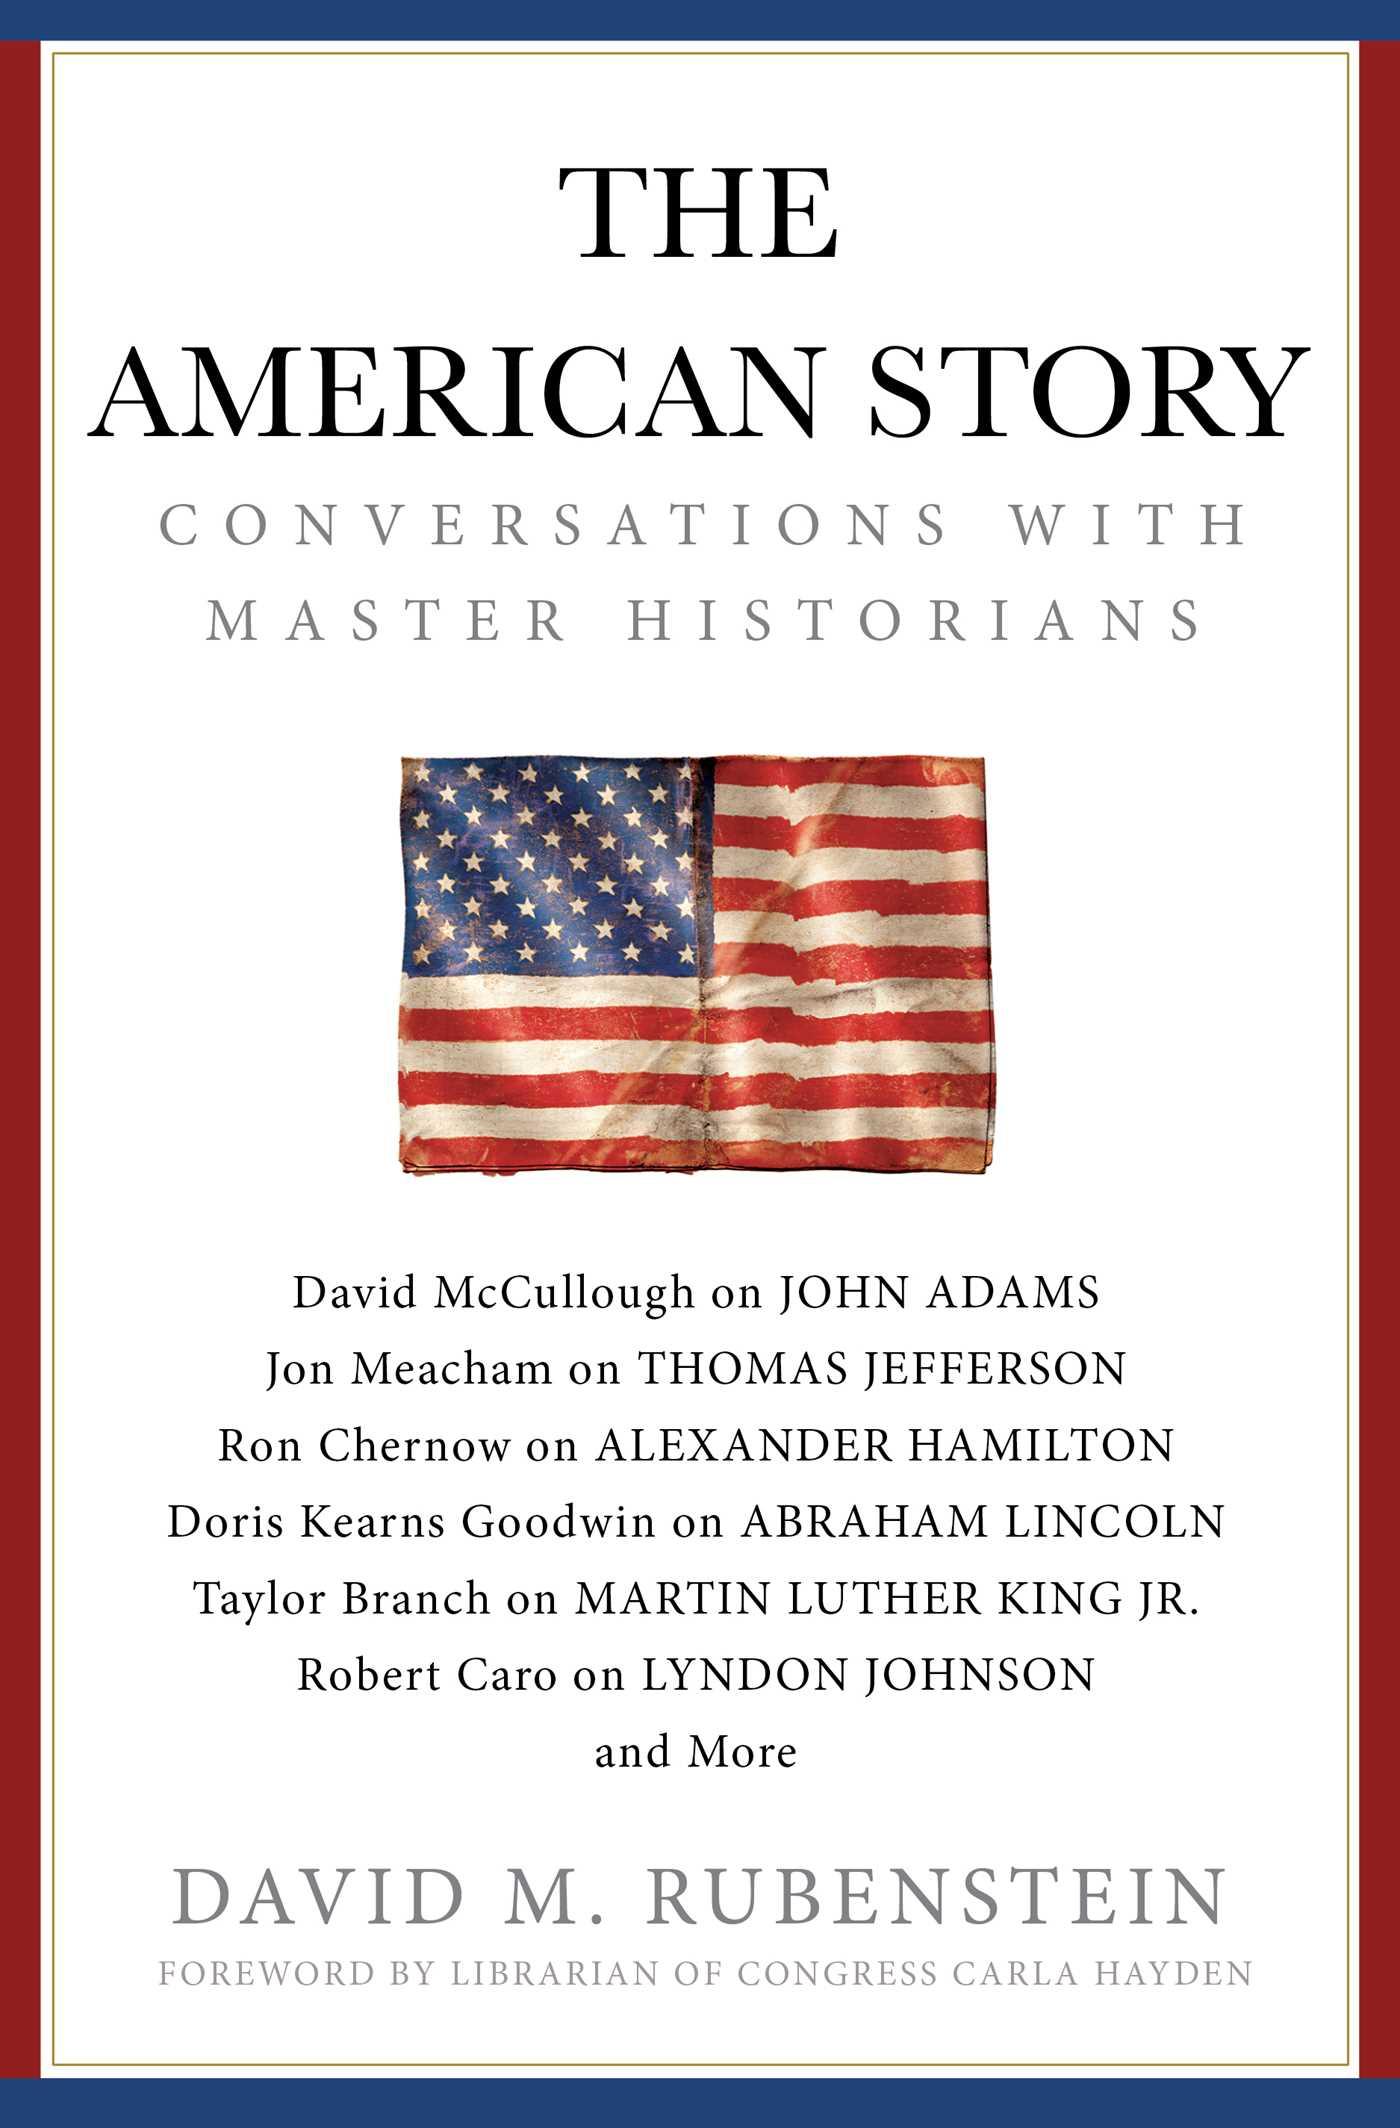 The American Story - David M. Rubenstein